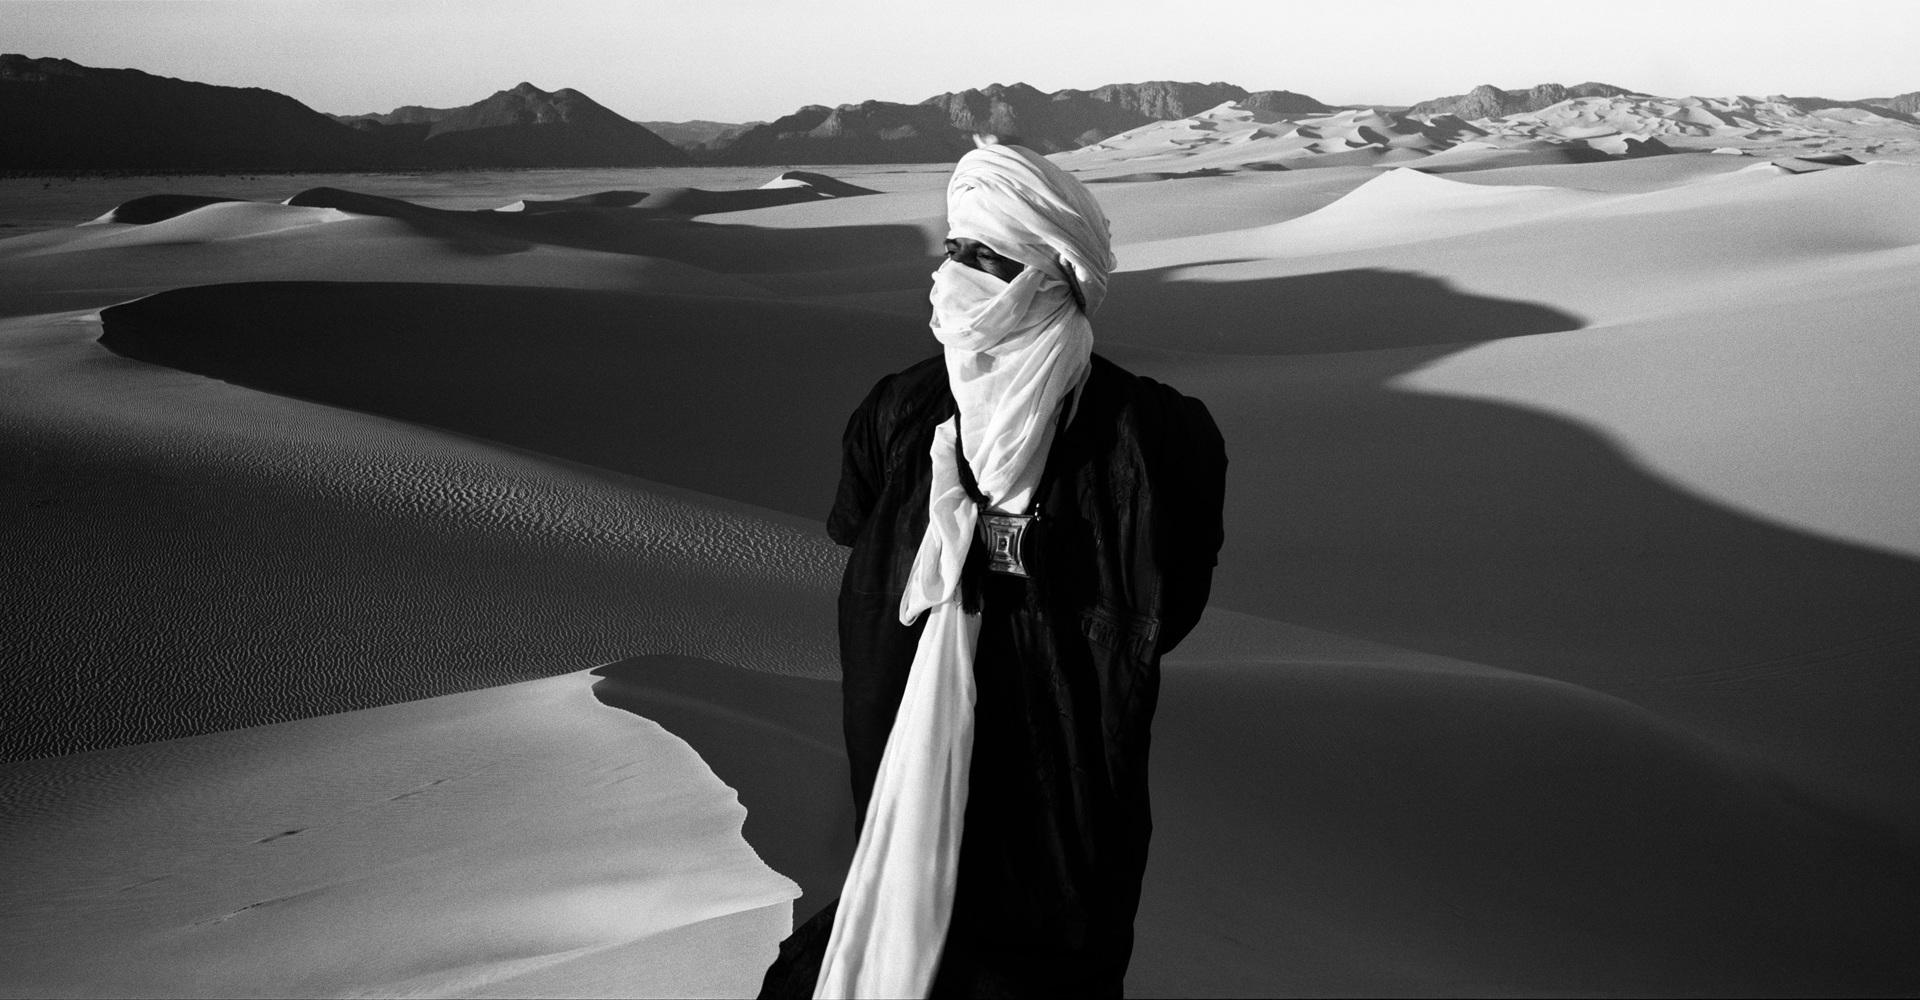 Tureg in Sahara Desert, Niger